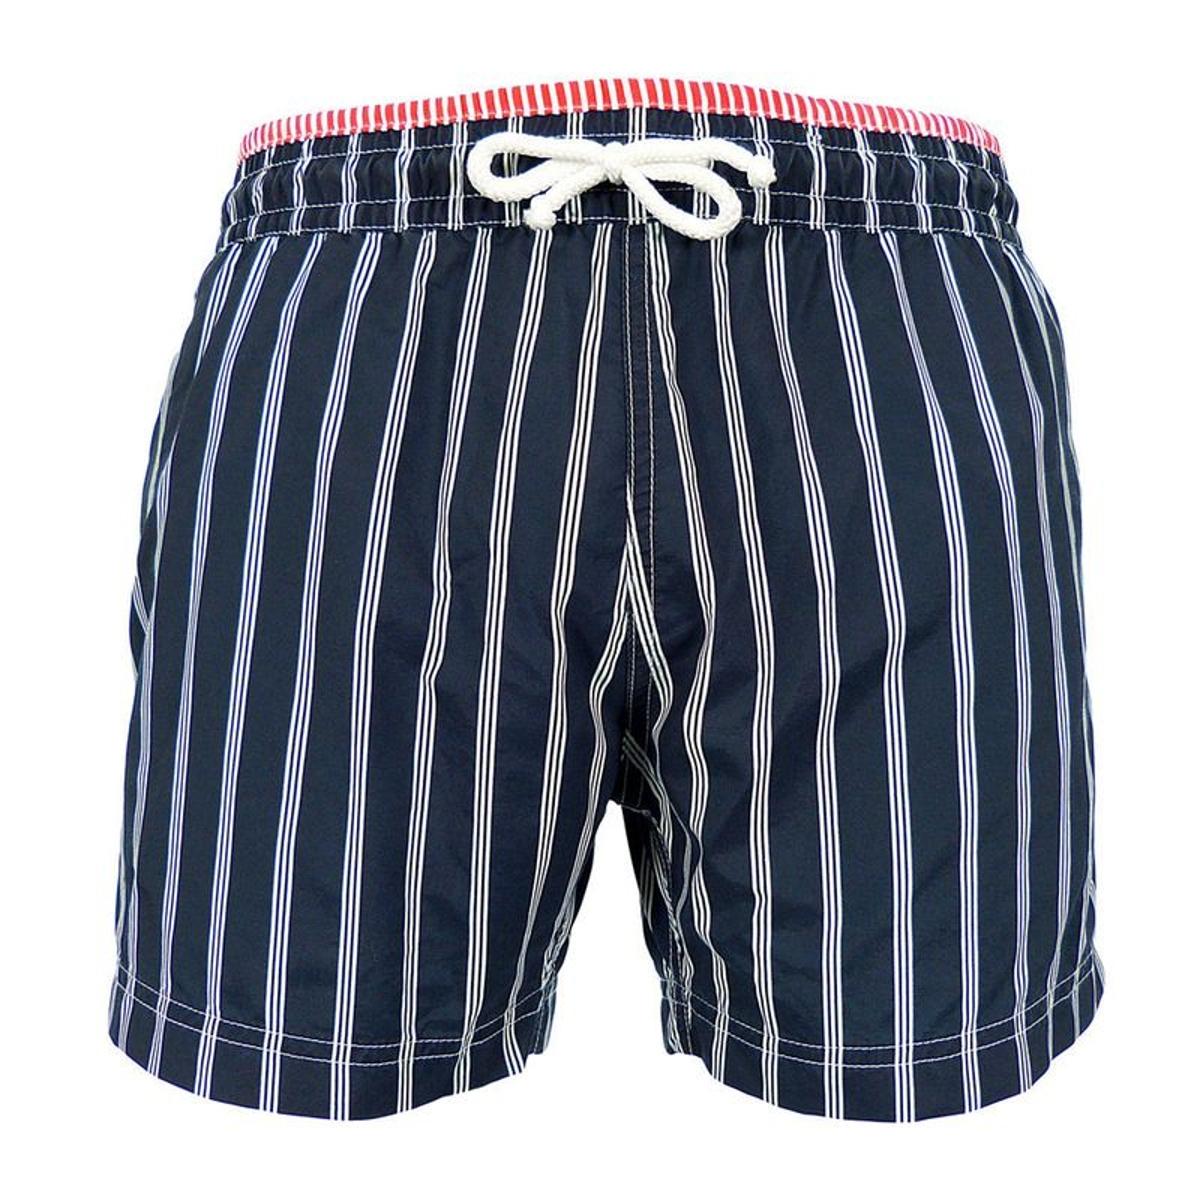 Maillot Short de bain homme New Jim - Triple rayures bleu marine